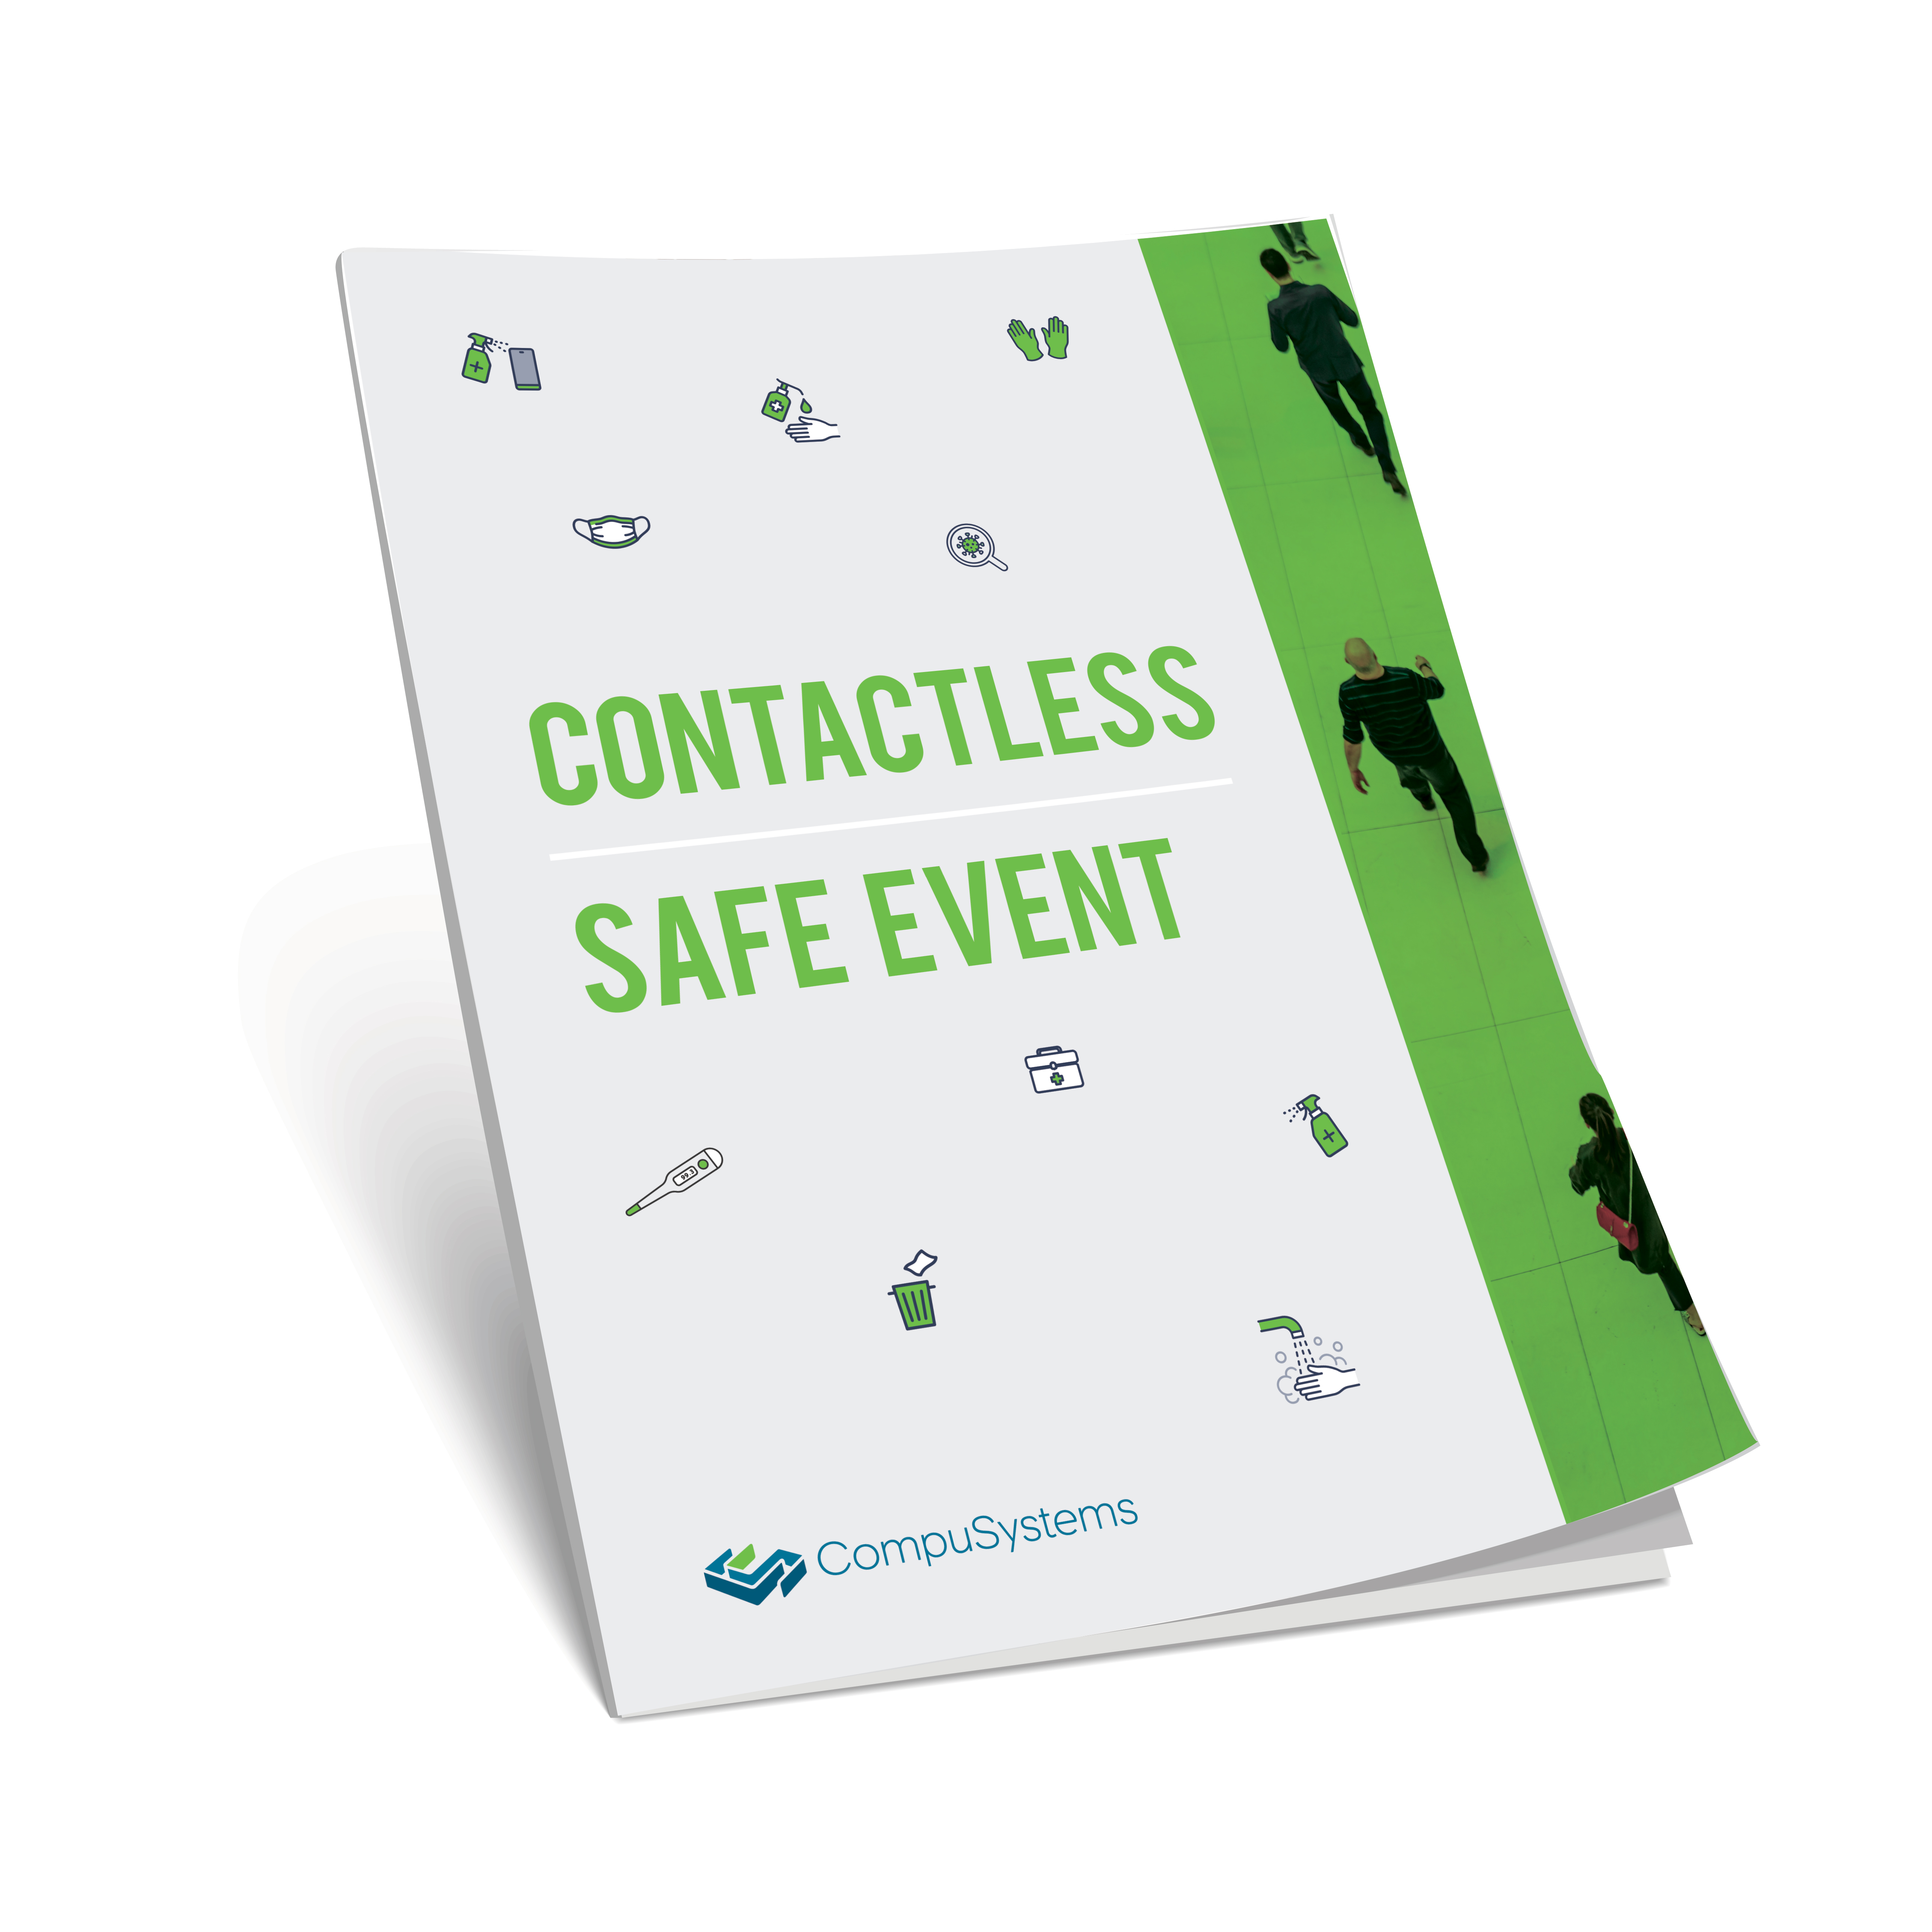 Safe Event magazine cover mockup